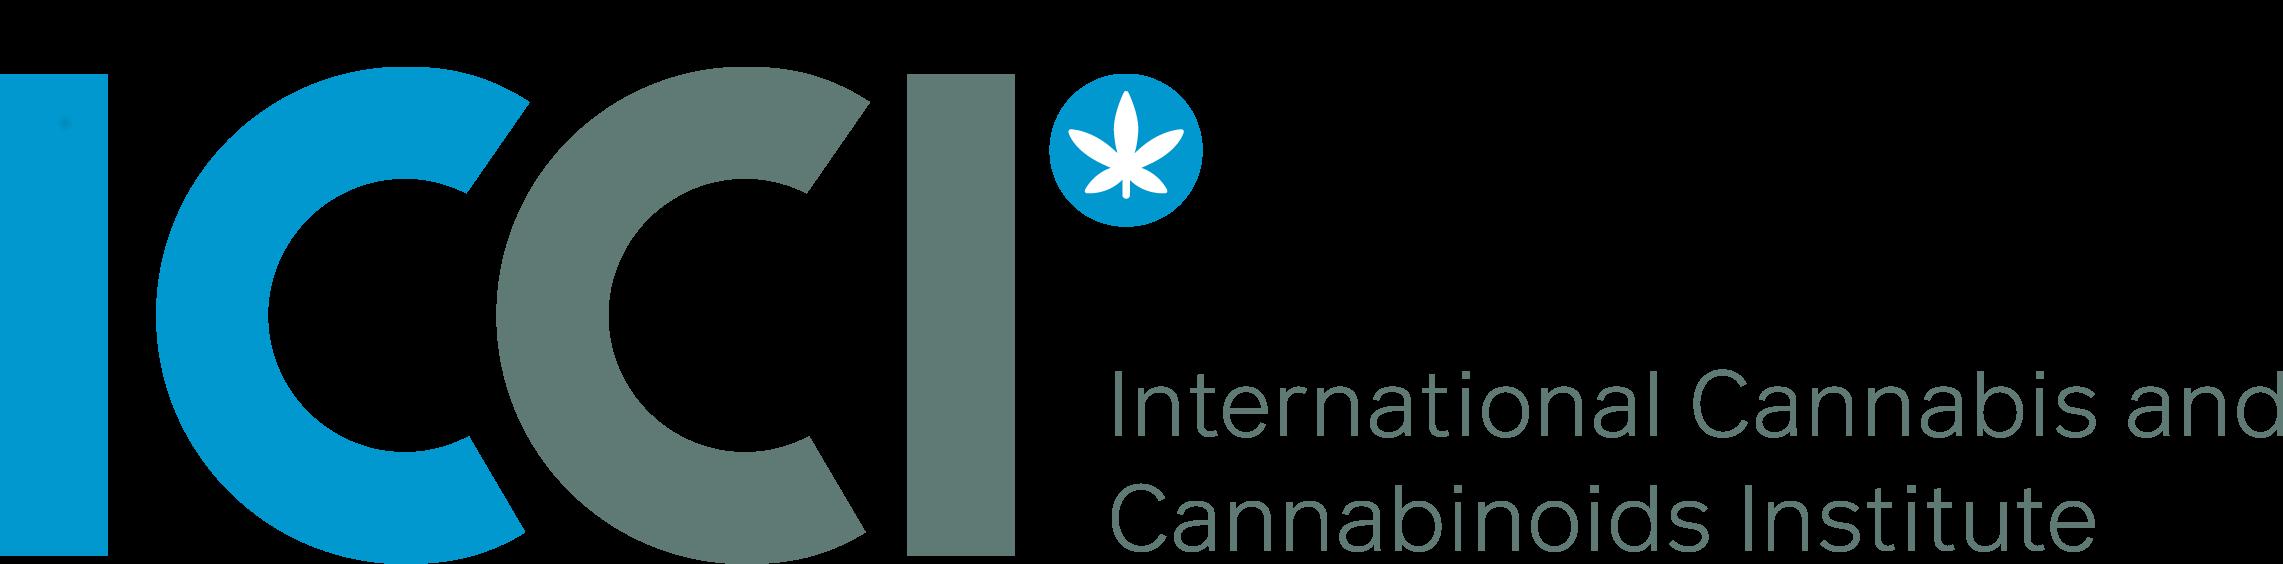 ICCI-logo_crop.png